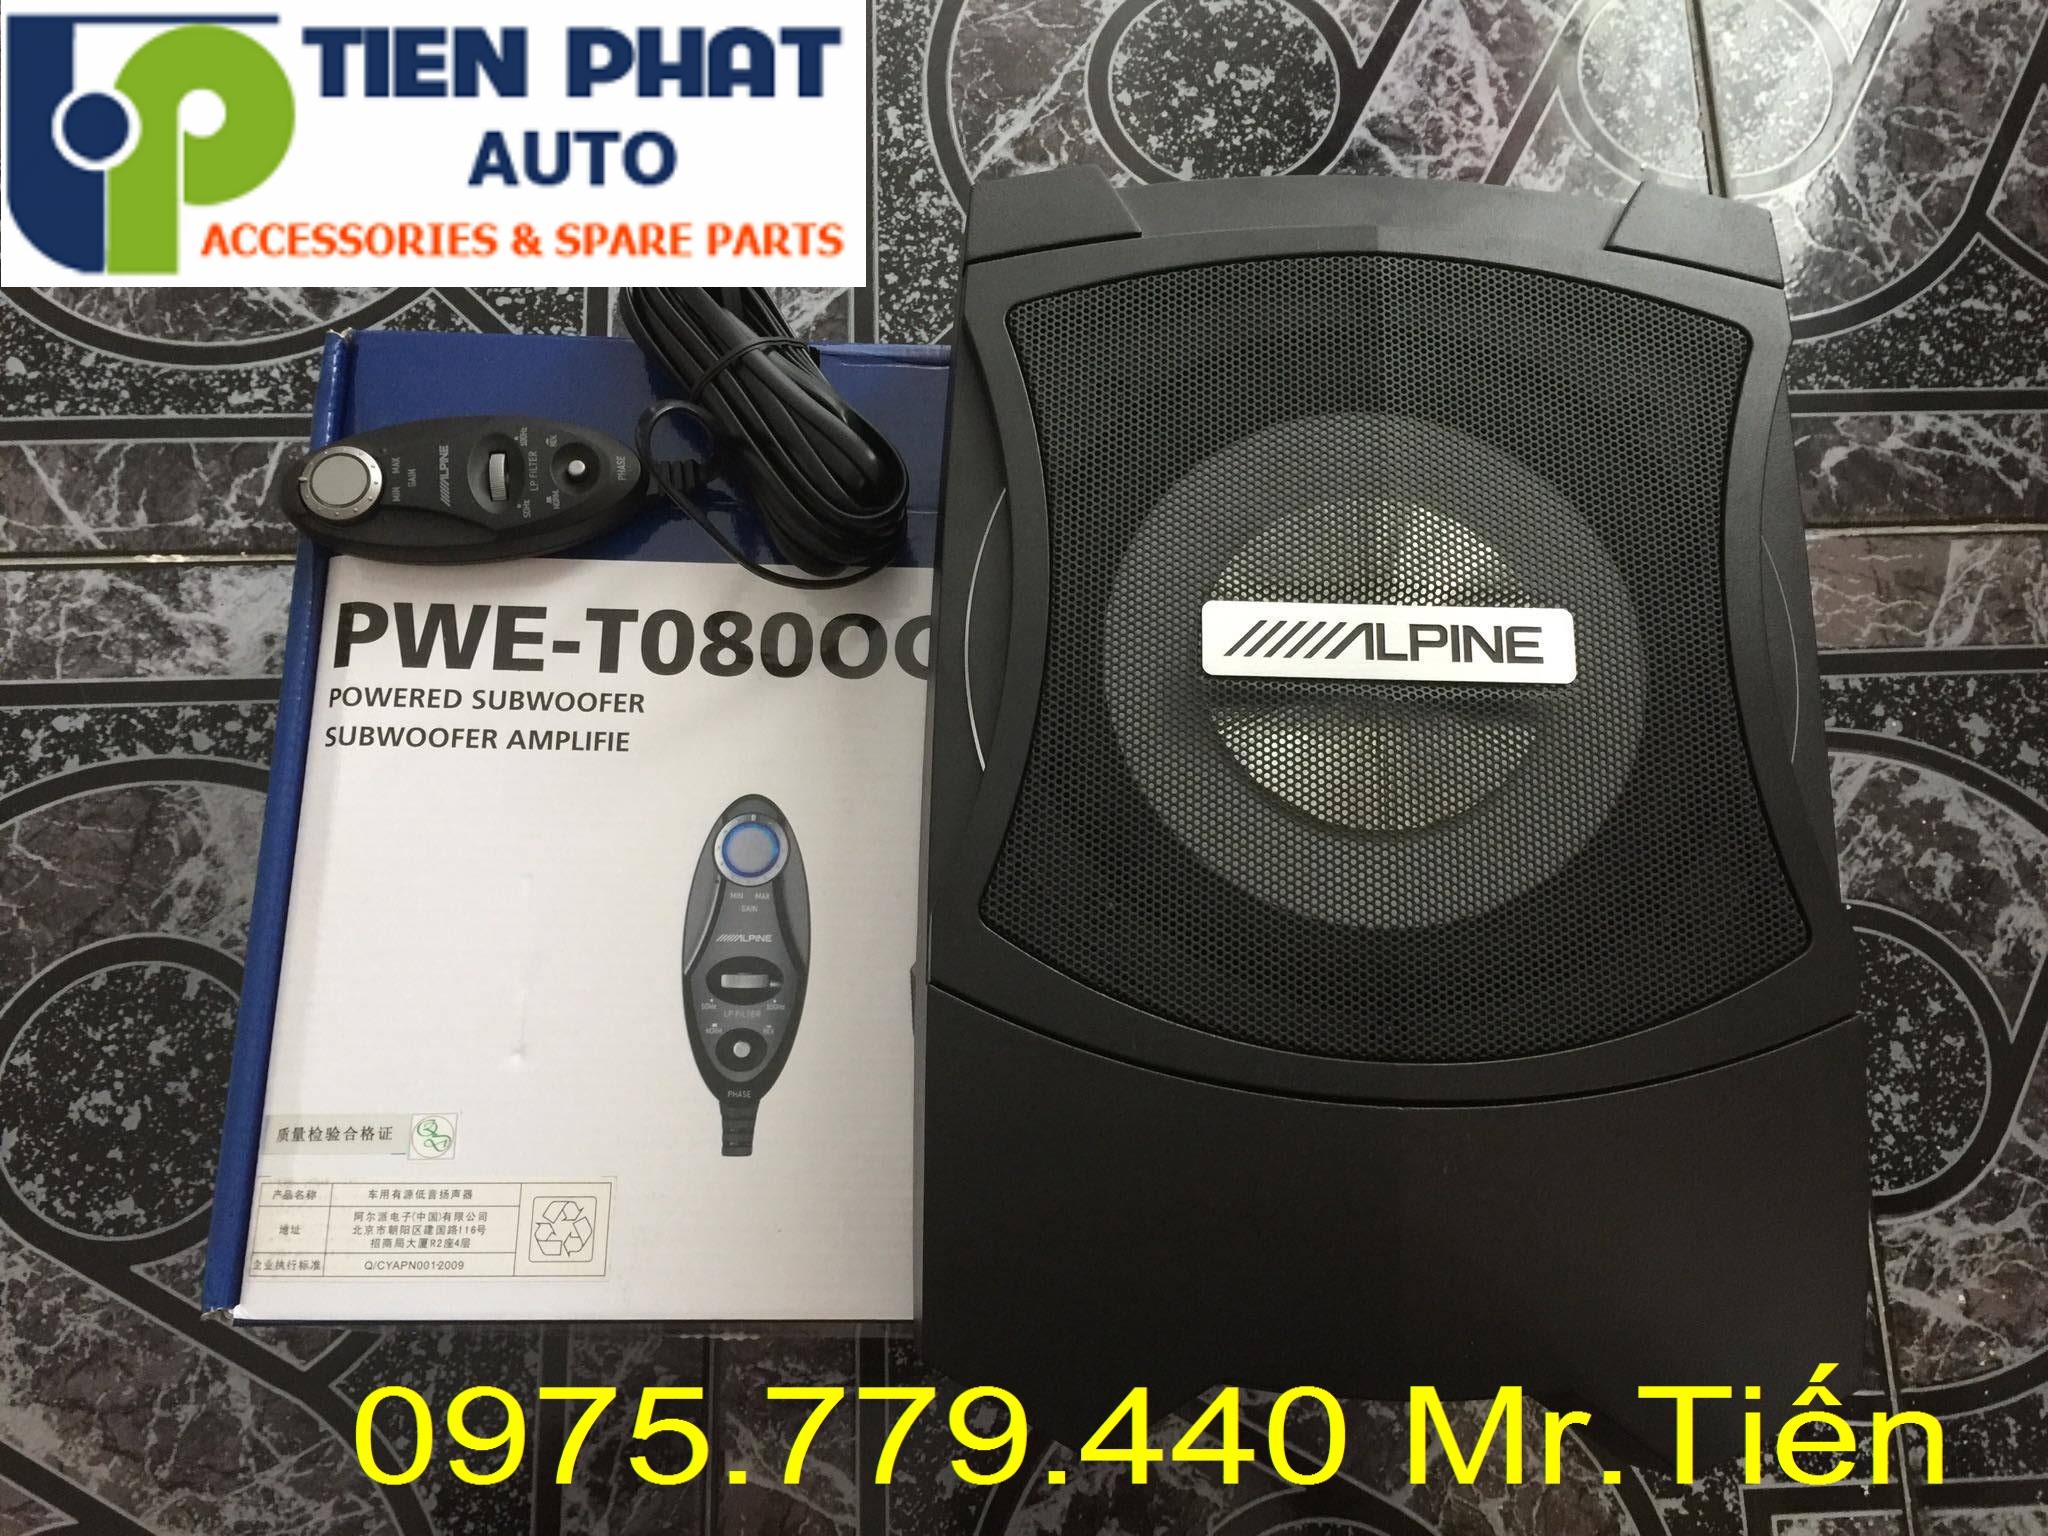 Lắp Loa sub Alpine PWE-T0800C cho Hyundai I20 Lắp Đặt Tận Nơi